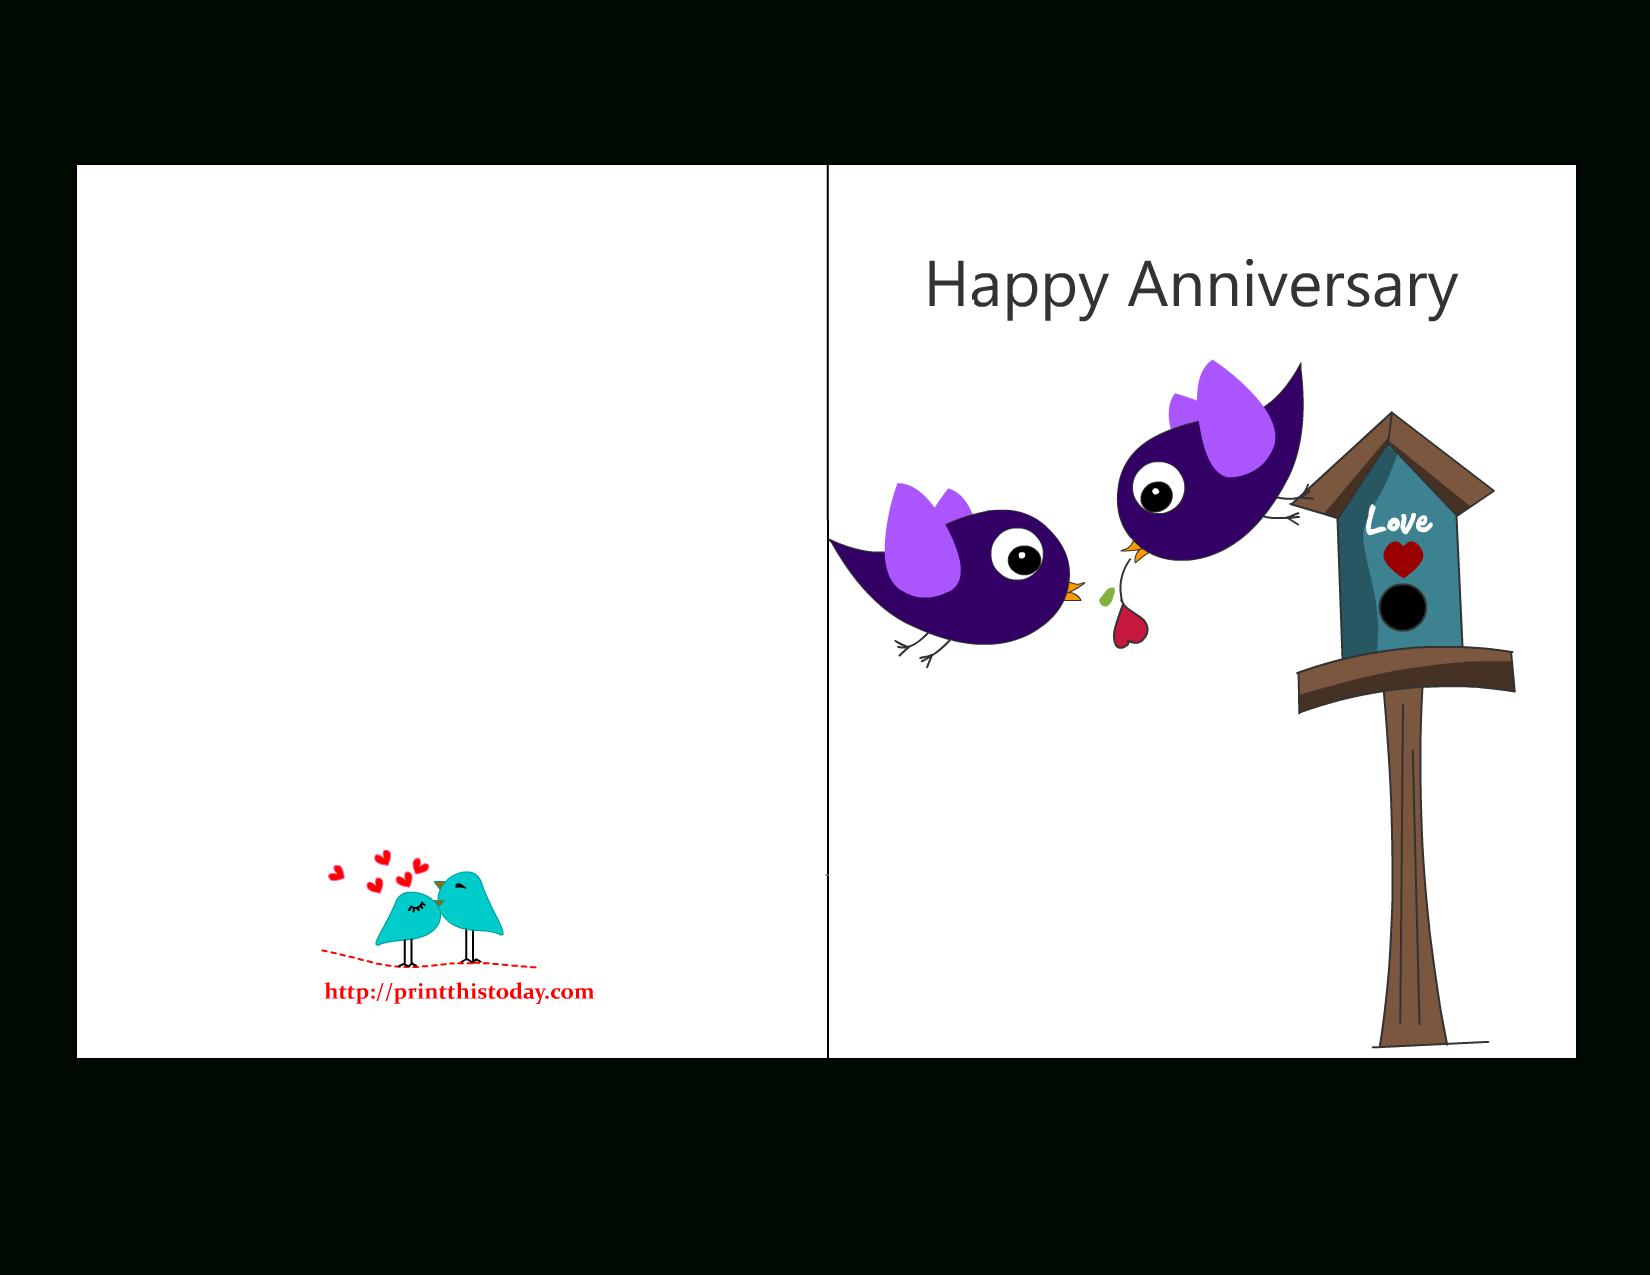 Free Anniversary Cards To Print   Free Printable Anniversary Cards - Printable Cards Free Anniversary